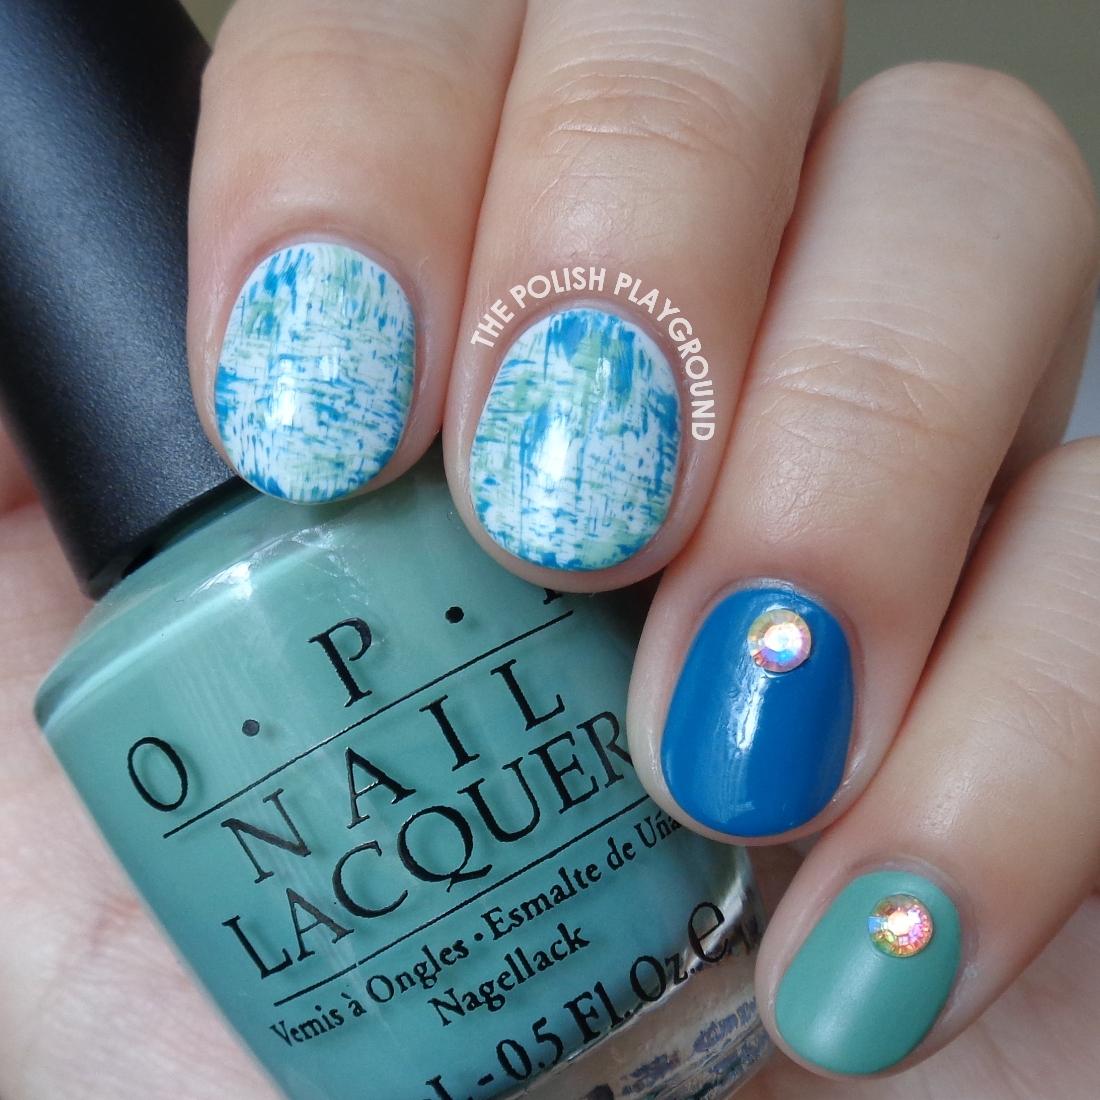 The polish playground blue green brushstroke nail art with blue and green brushstroke nail art with rhinestones prinsesfo Images